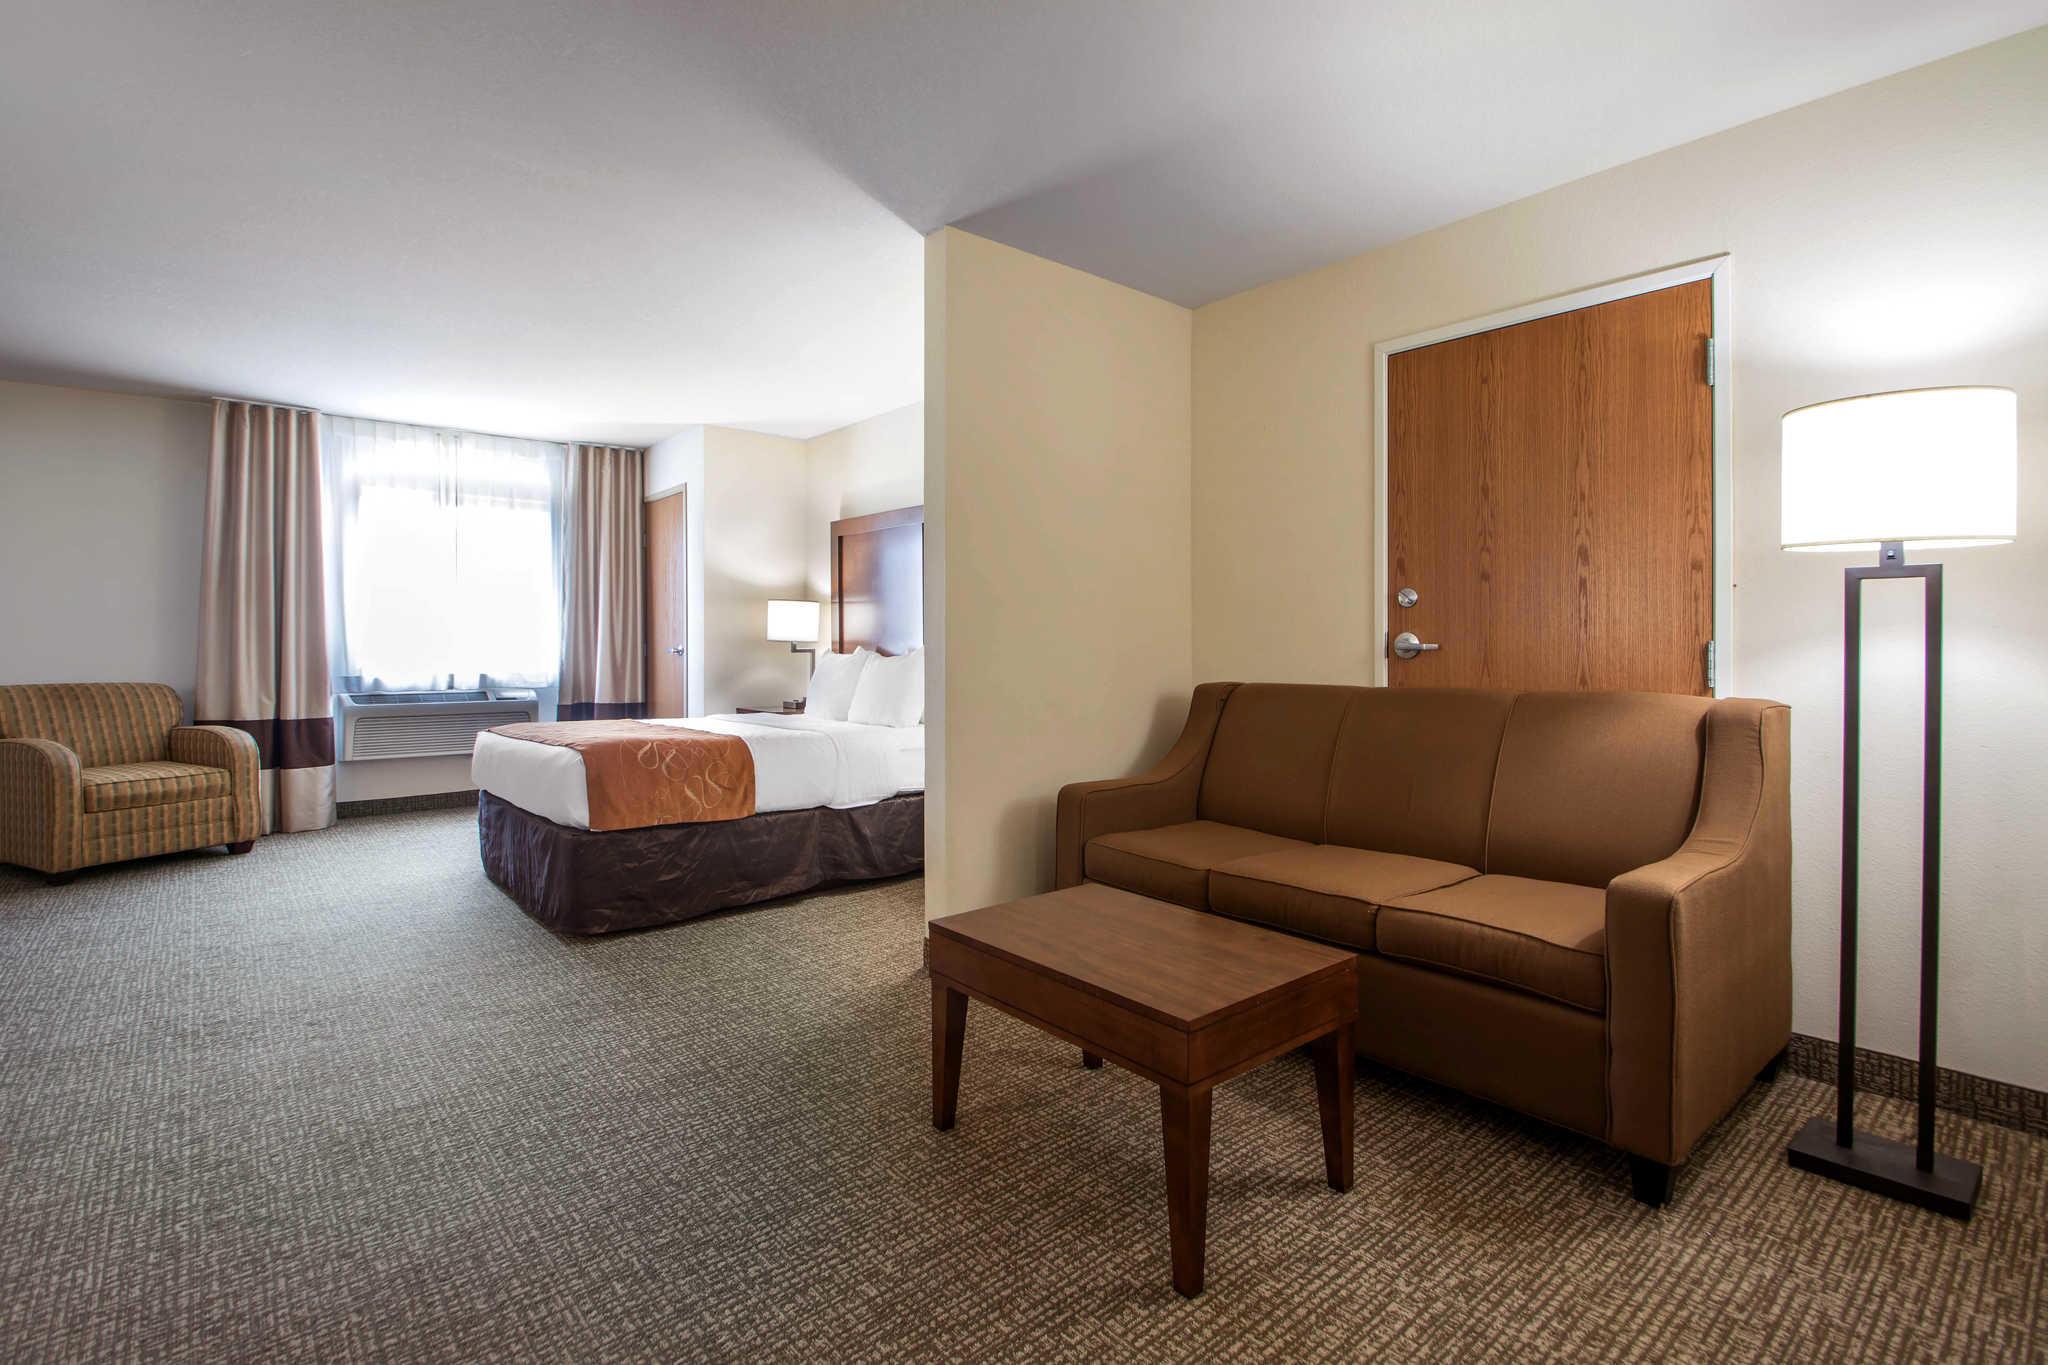 Comfort Suites Johnson Creek Conference Center image 21